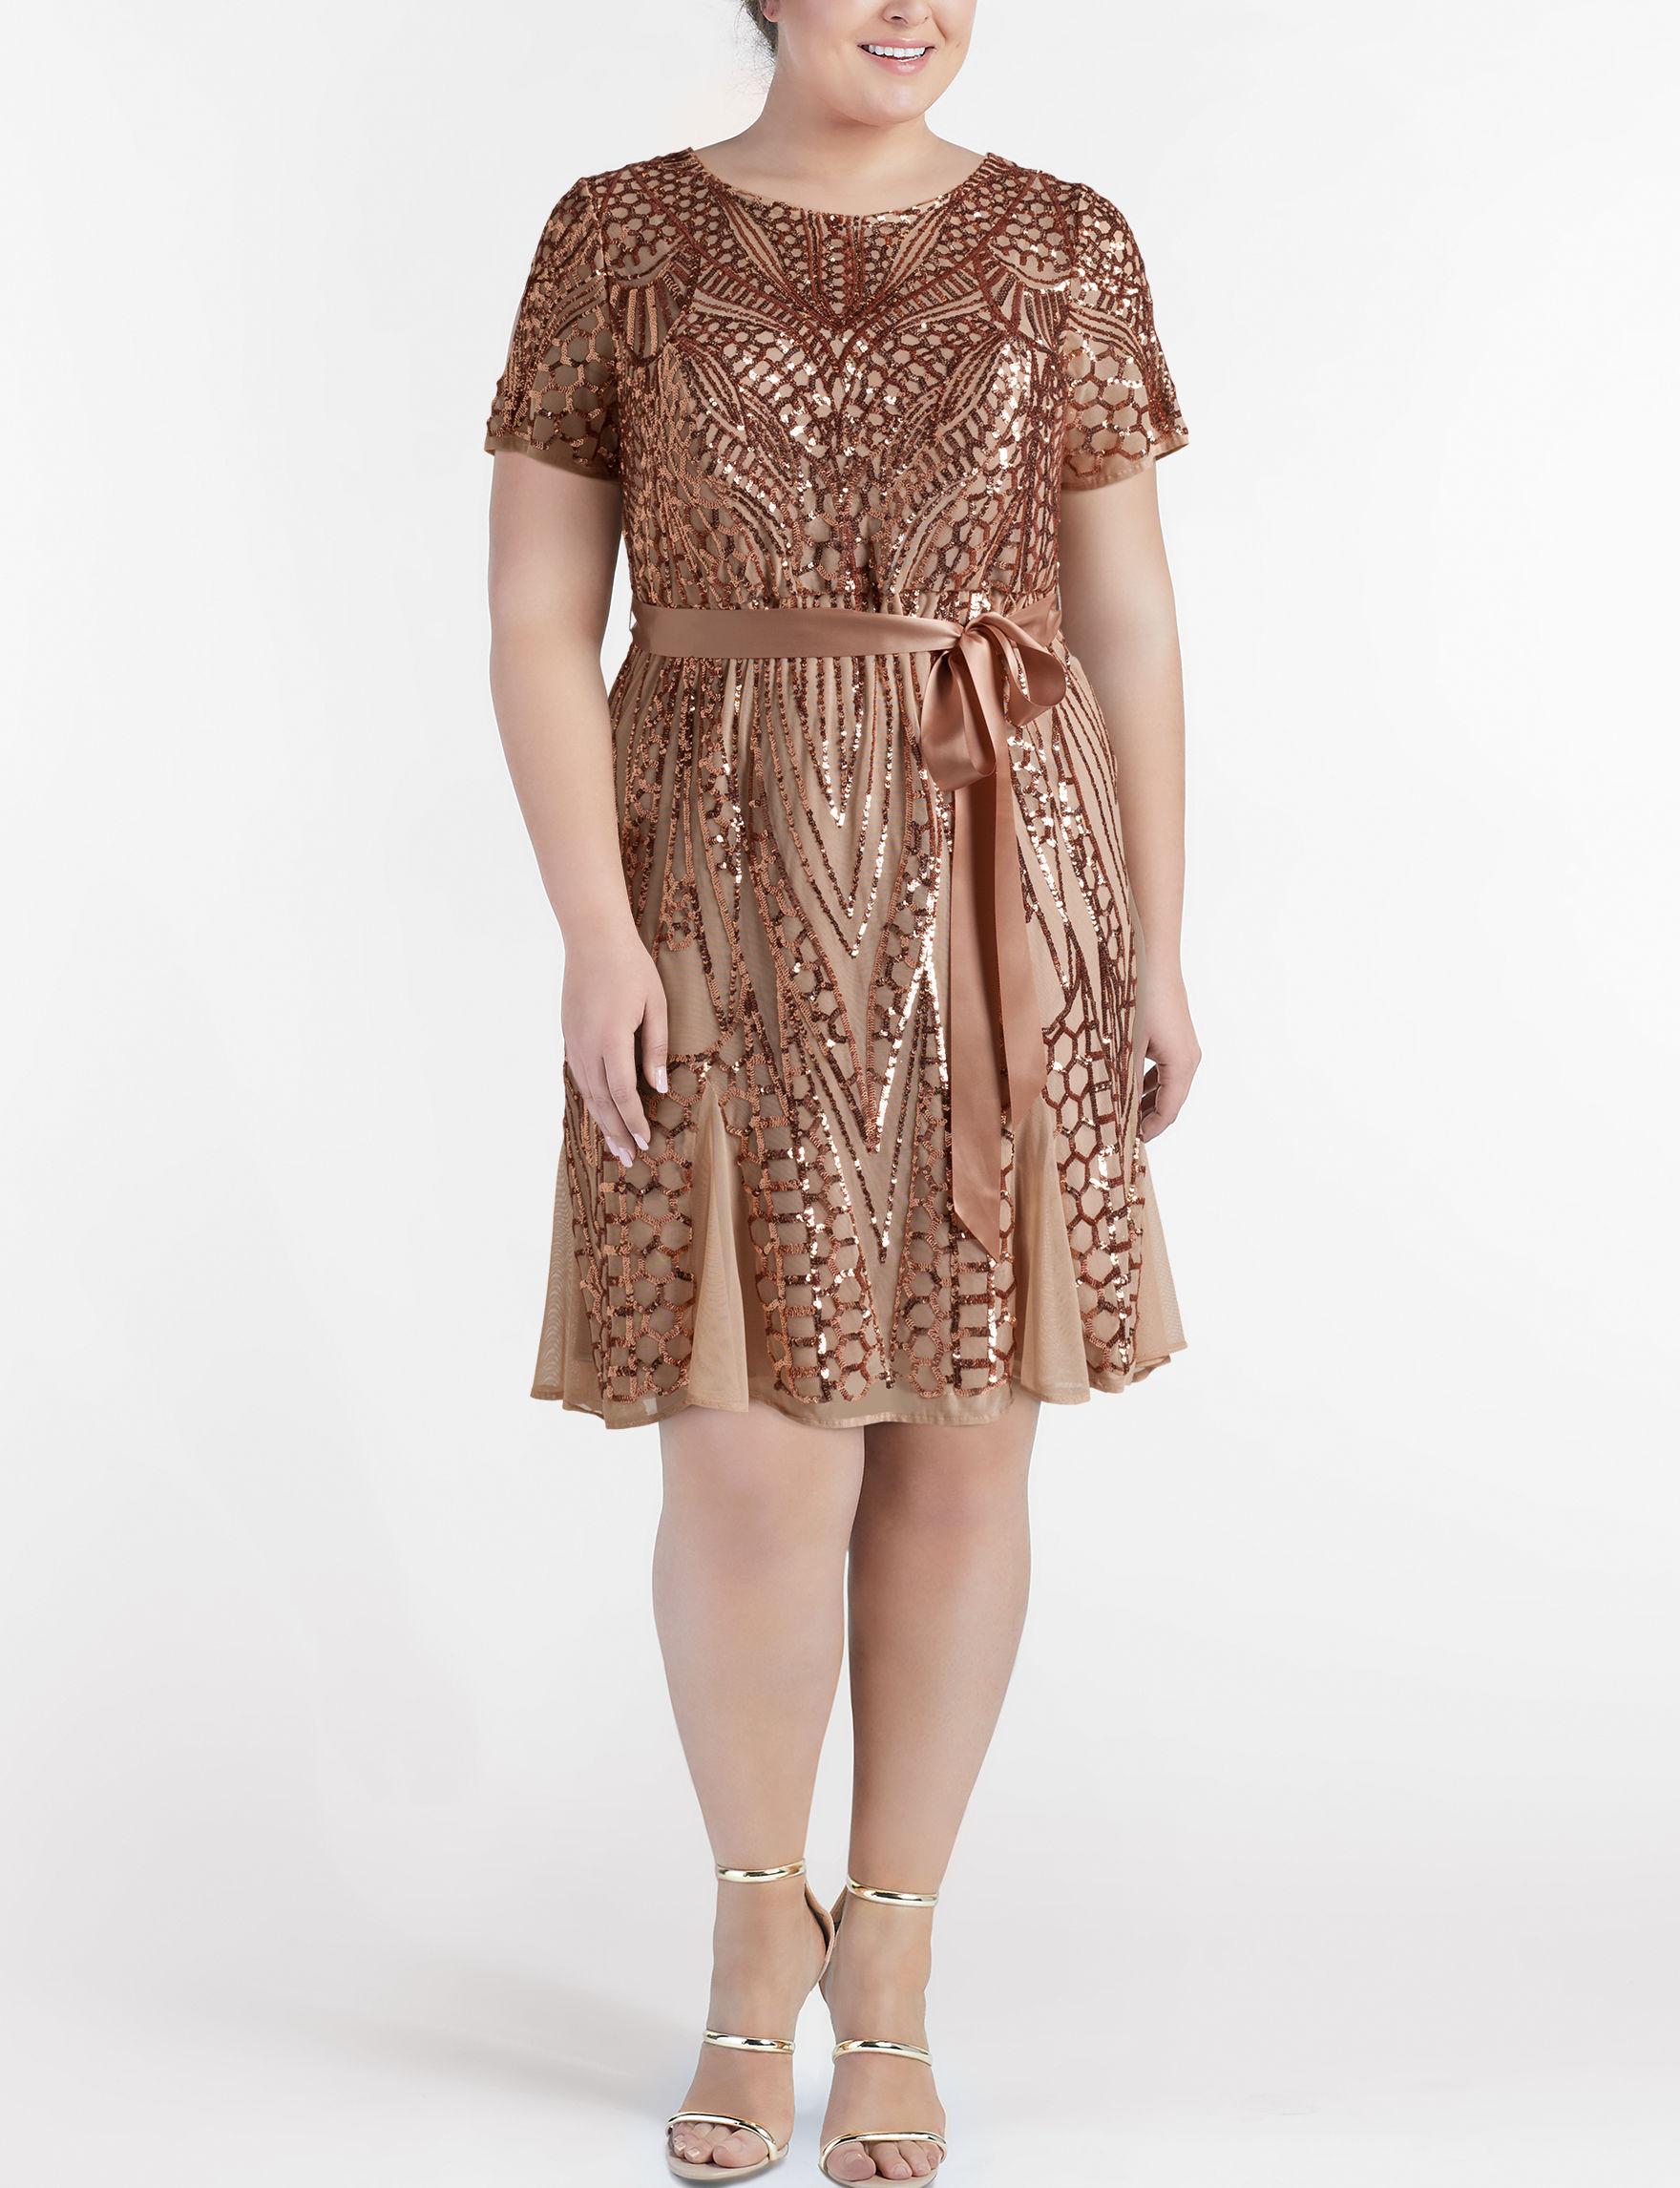 R & M Richards Rose Gold Cocktail & Party Evening & Formal A-line Dresses Fit & Flare Dresses